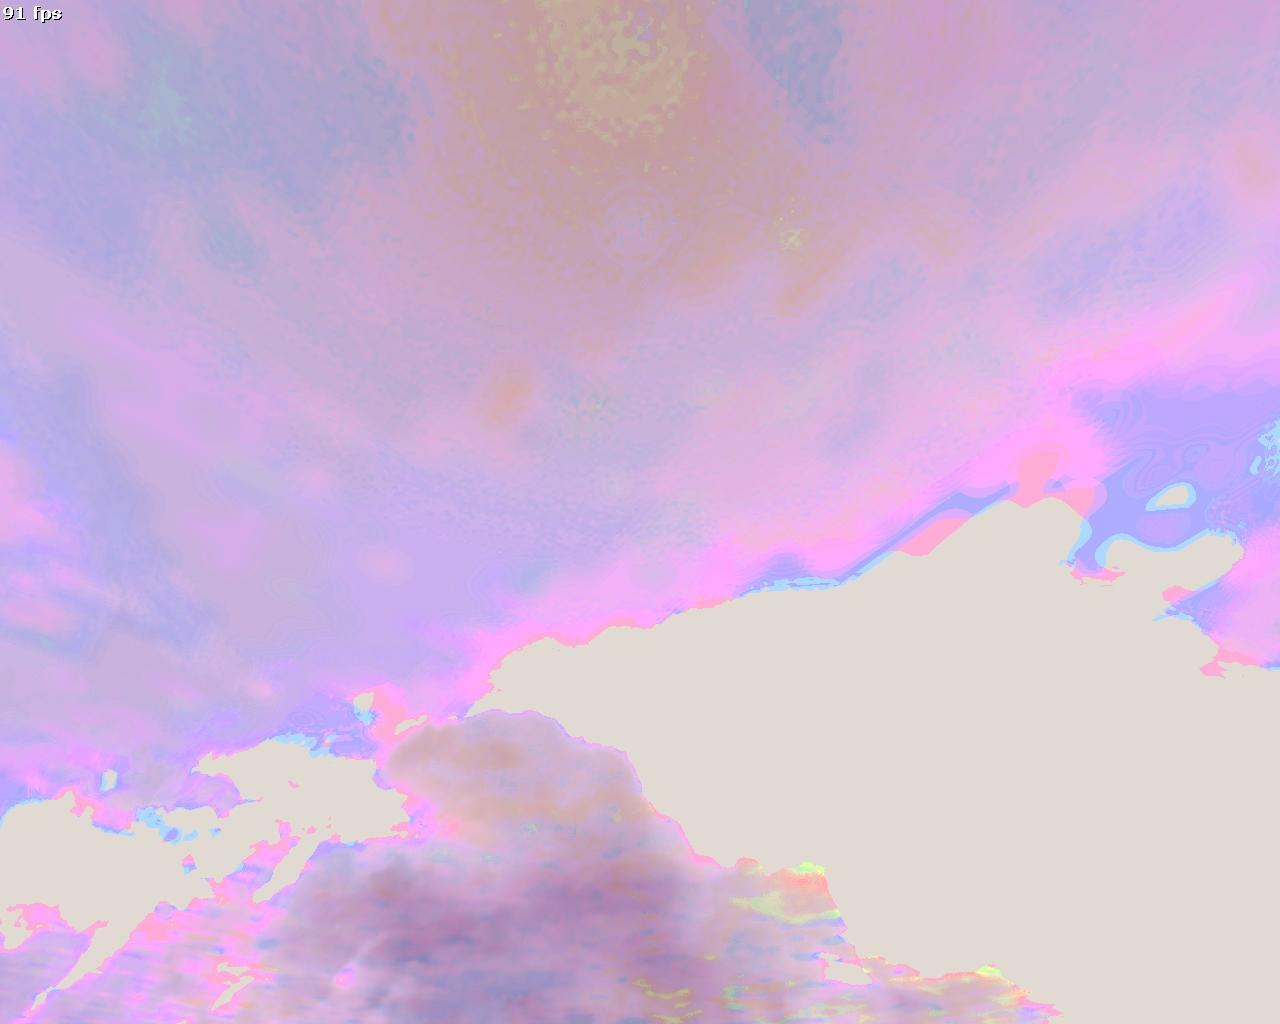 wintersedge0029.jpg - Half-Life